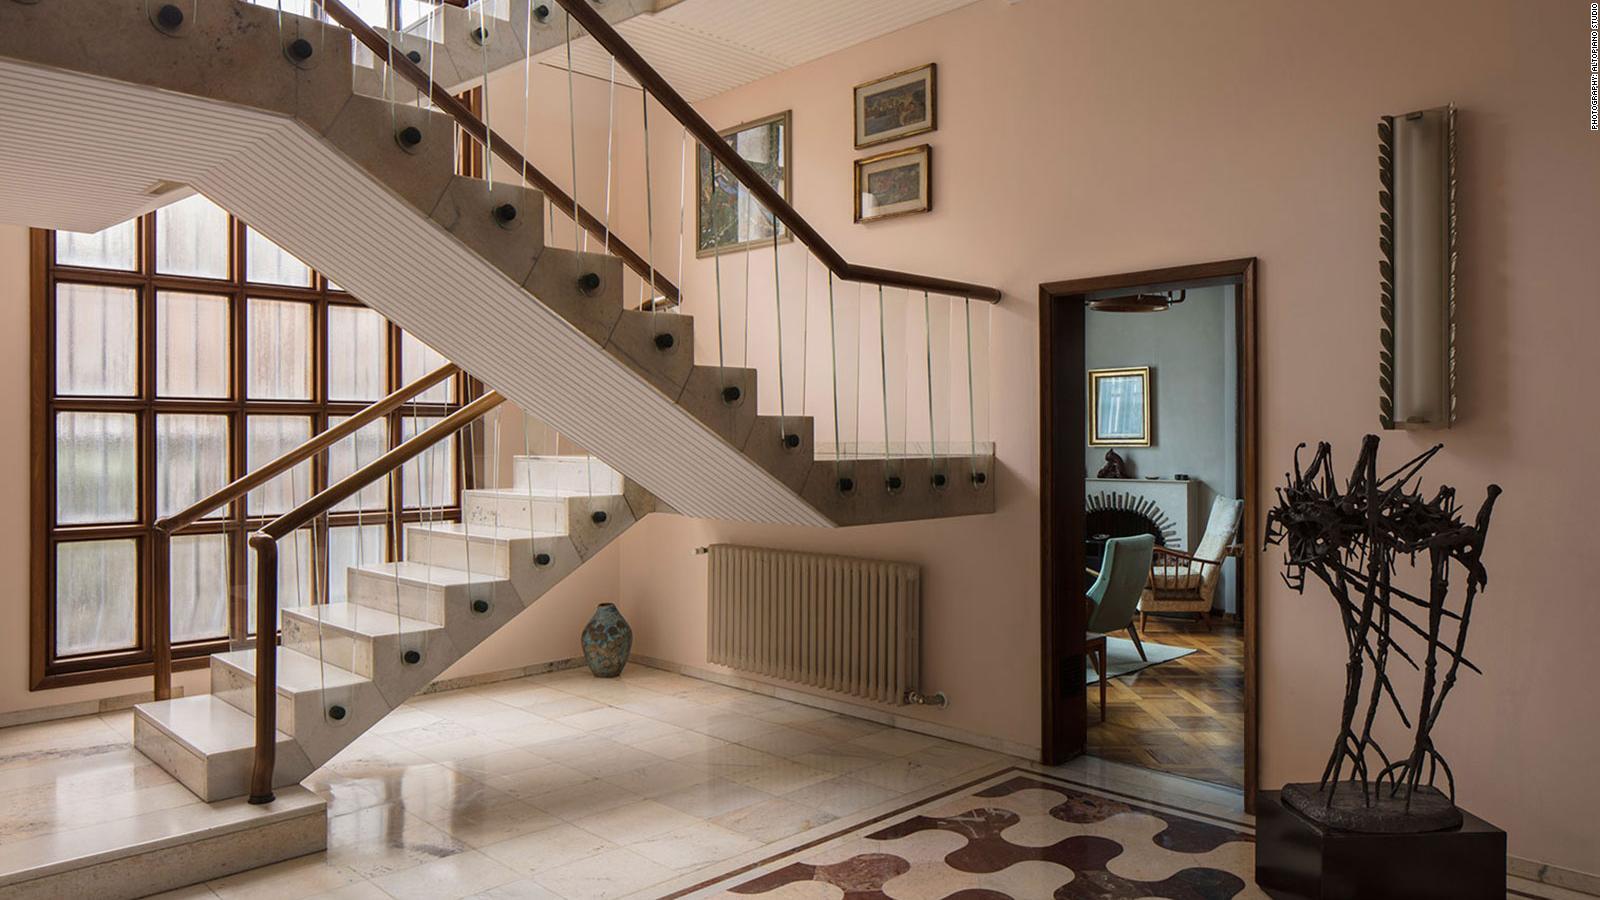 62229ca3af Milan Design Week: 10 installations not to miss - CNN Style